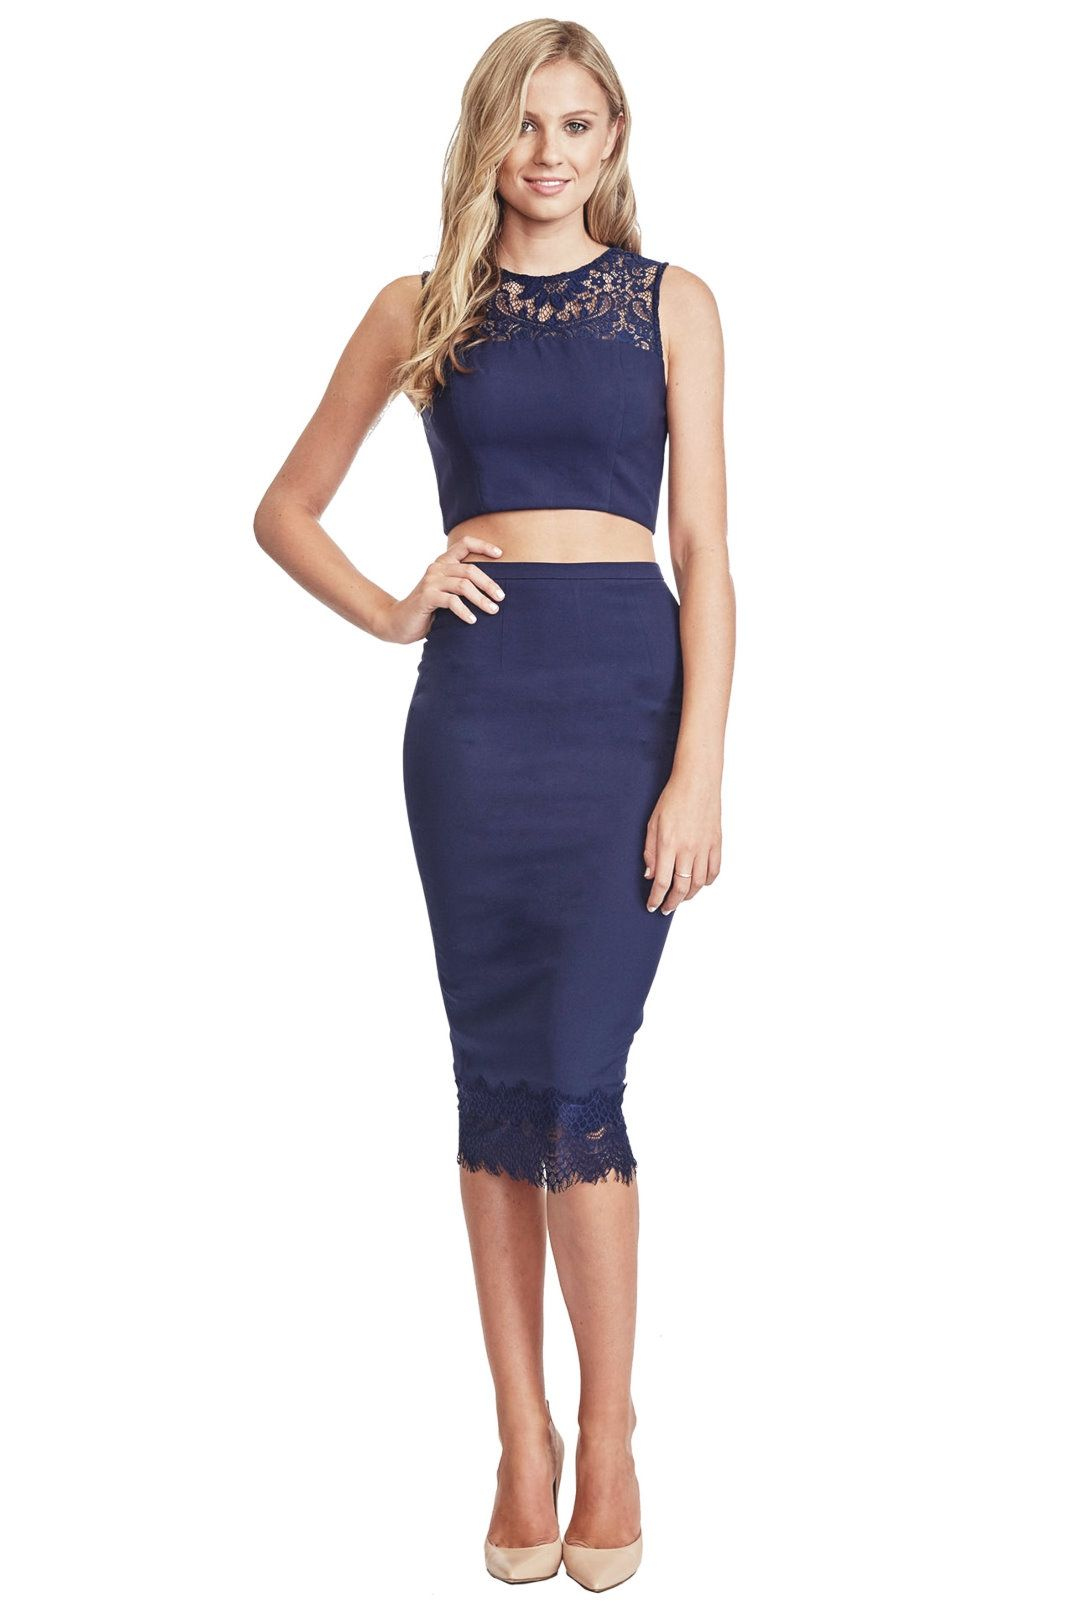 Elle Zeitoune - Sheratron Dress - Navy - Front